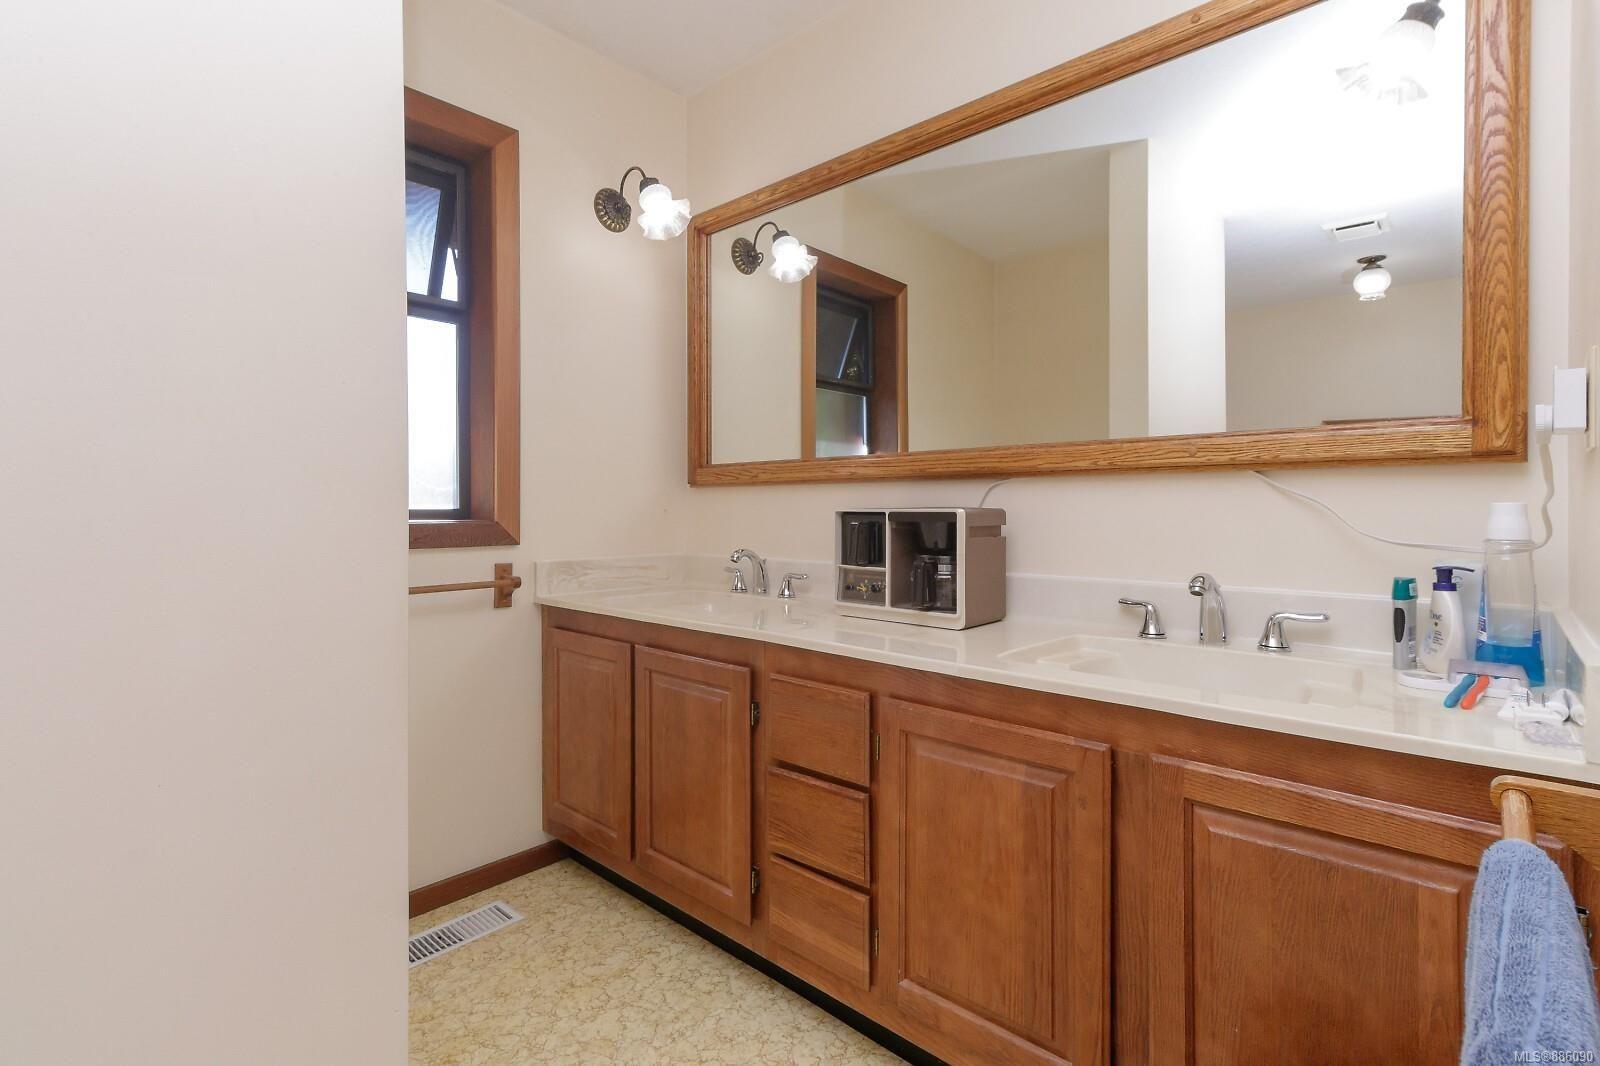 Photo 19: Photos: 4553 Blenkinsop Rd in : SE Blenkinsop House for sale (Saanich East)  : MLS®# 886090